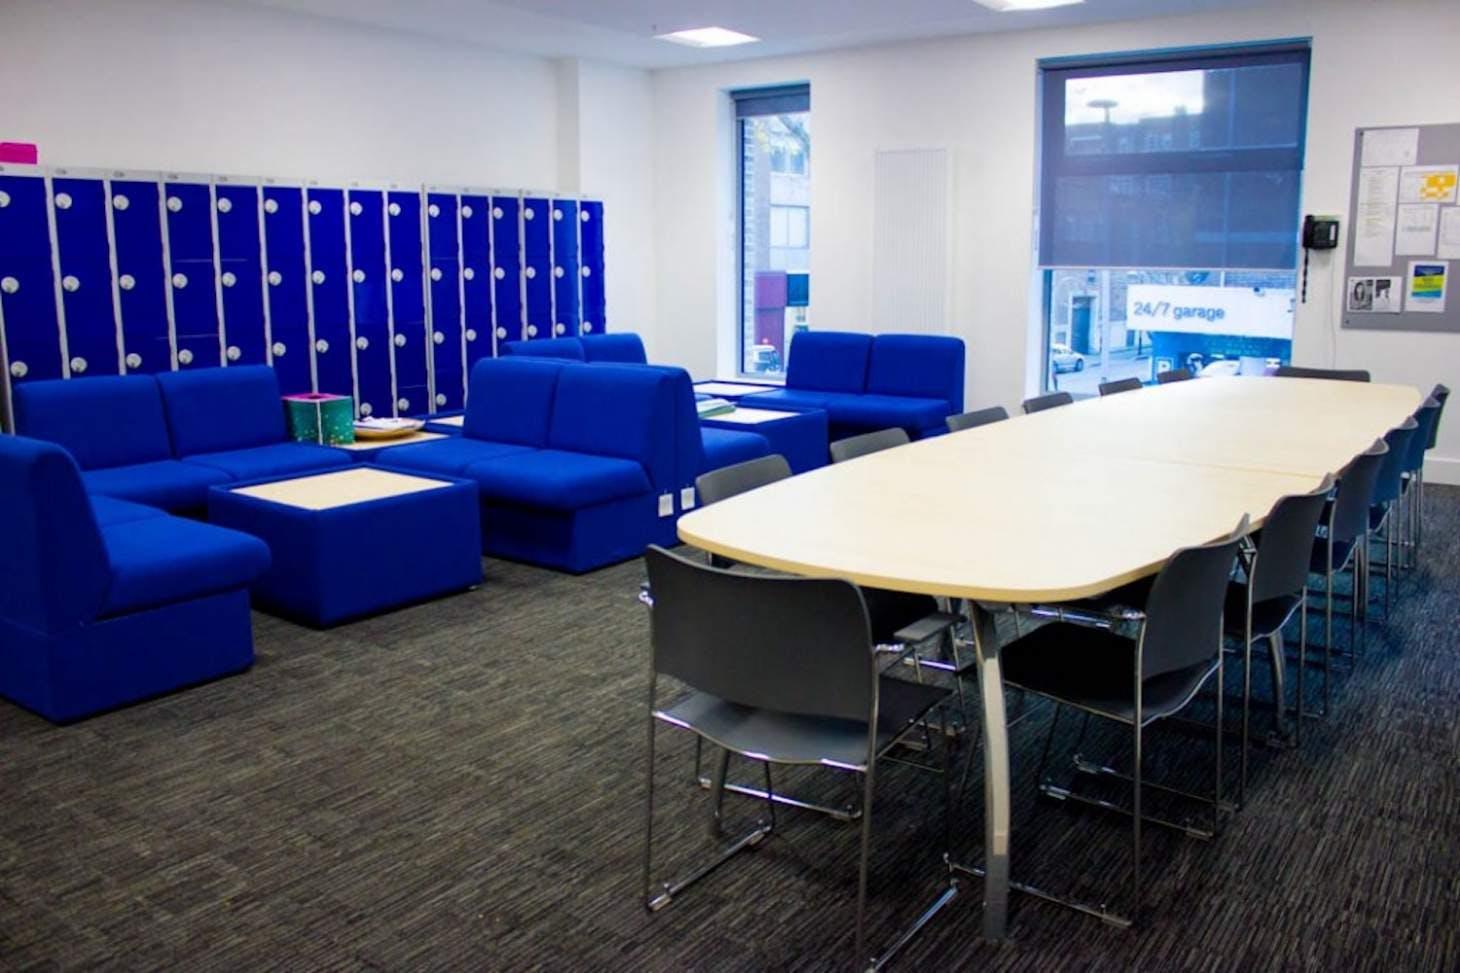 Marlborough Primary School Meeting room space hire